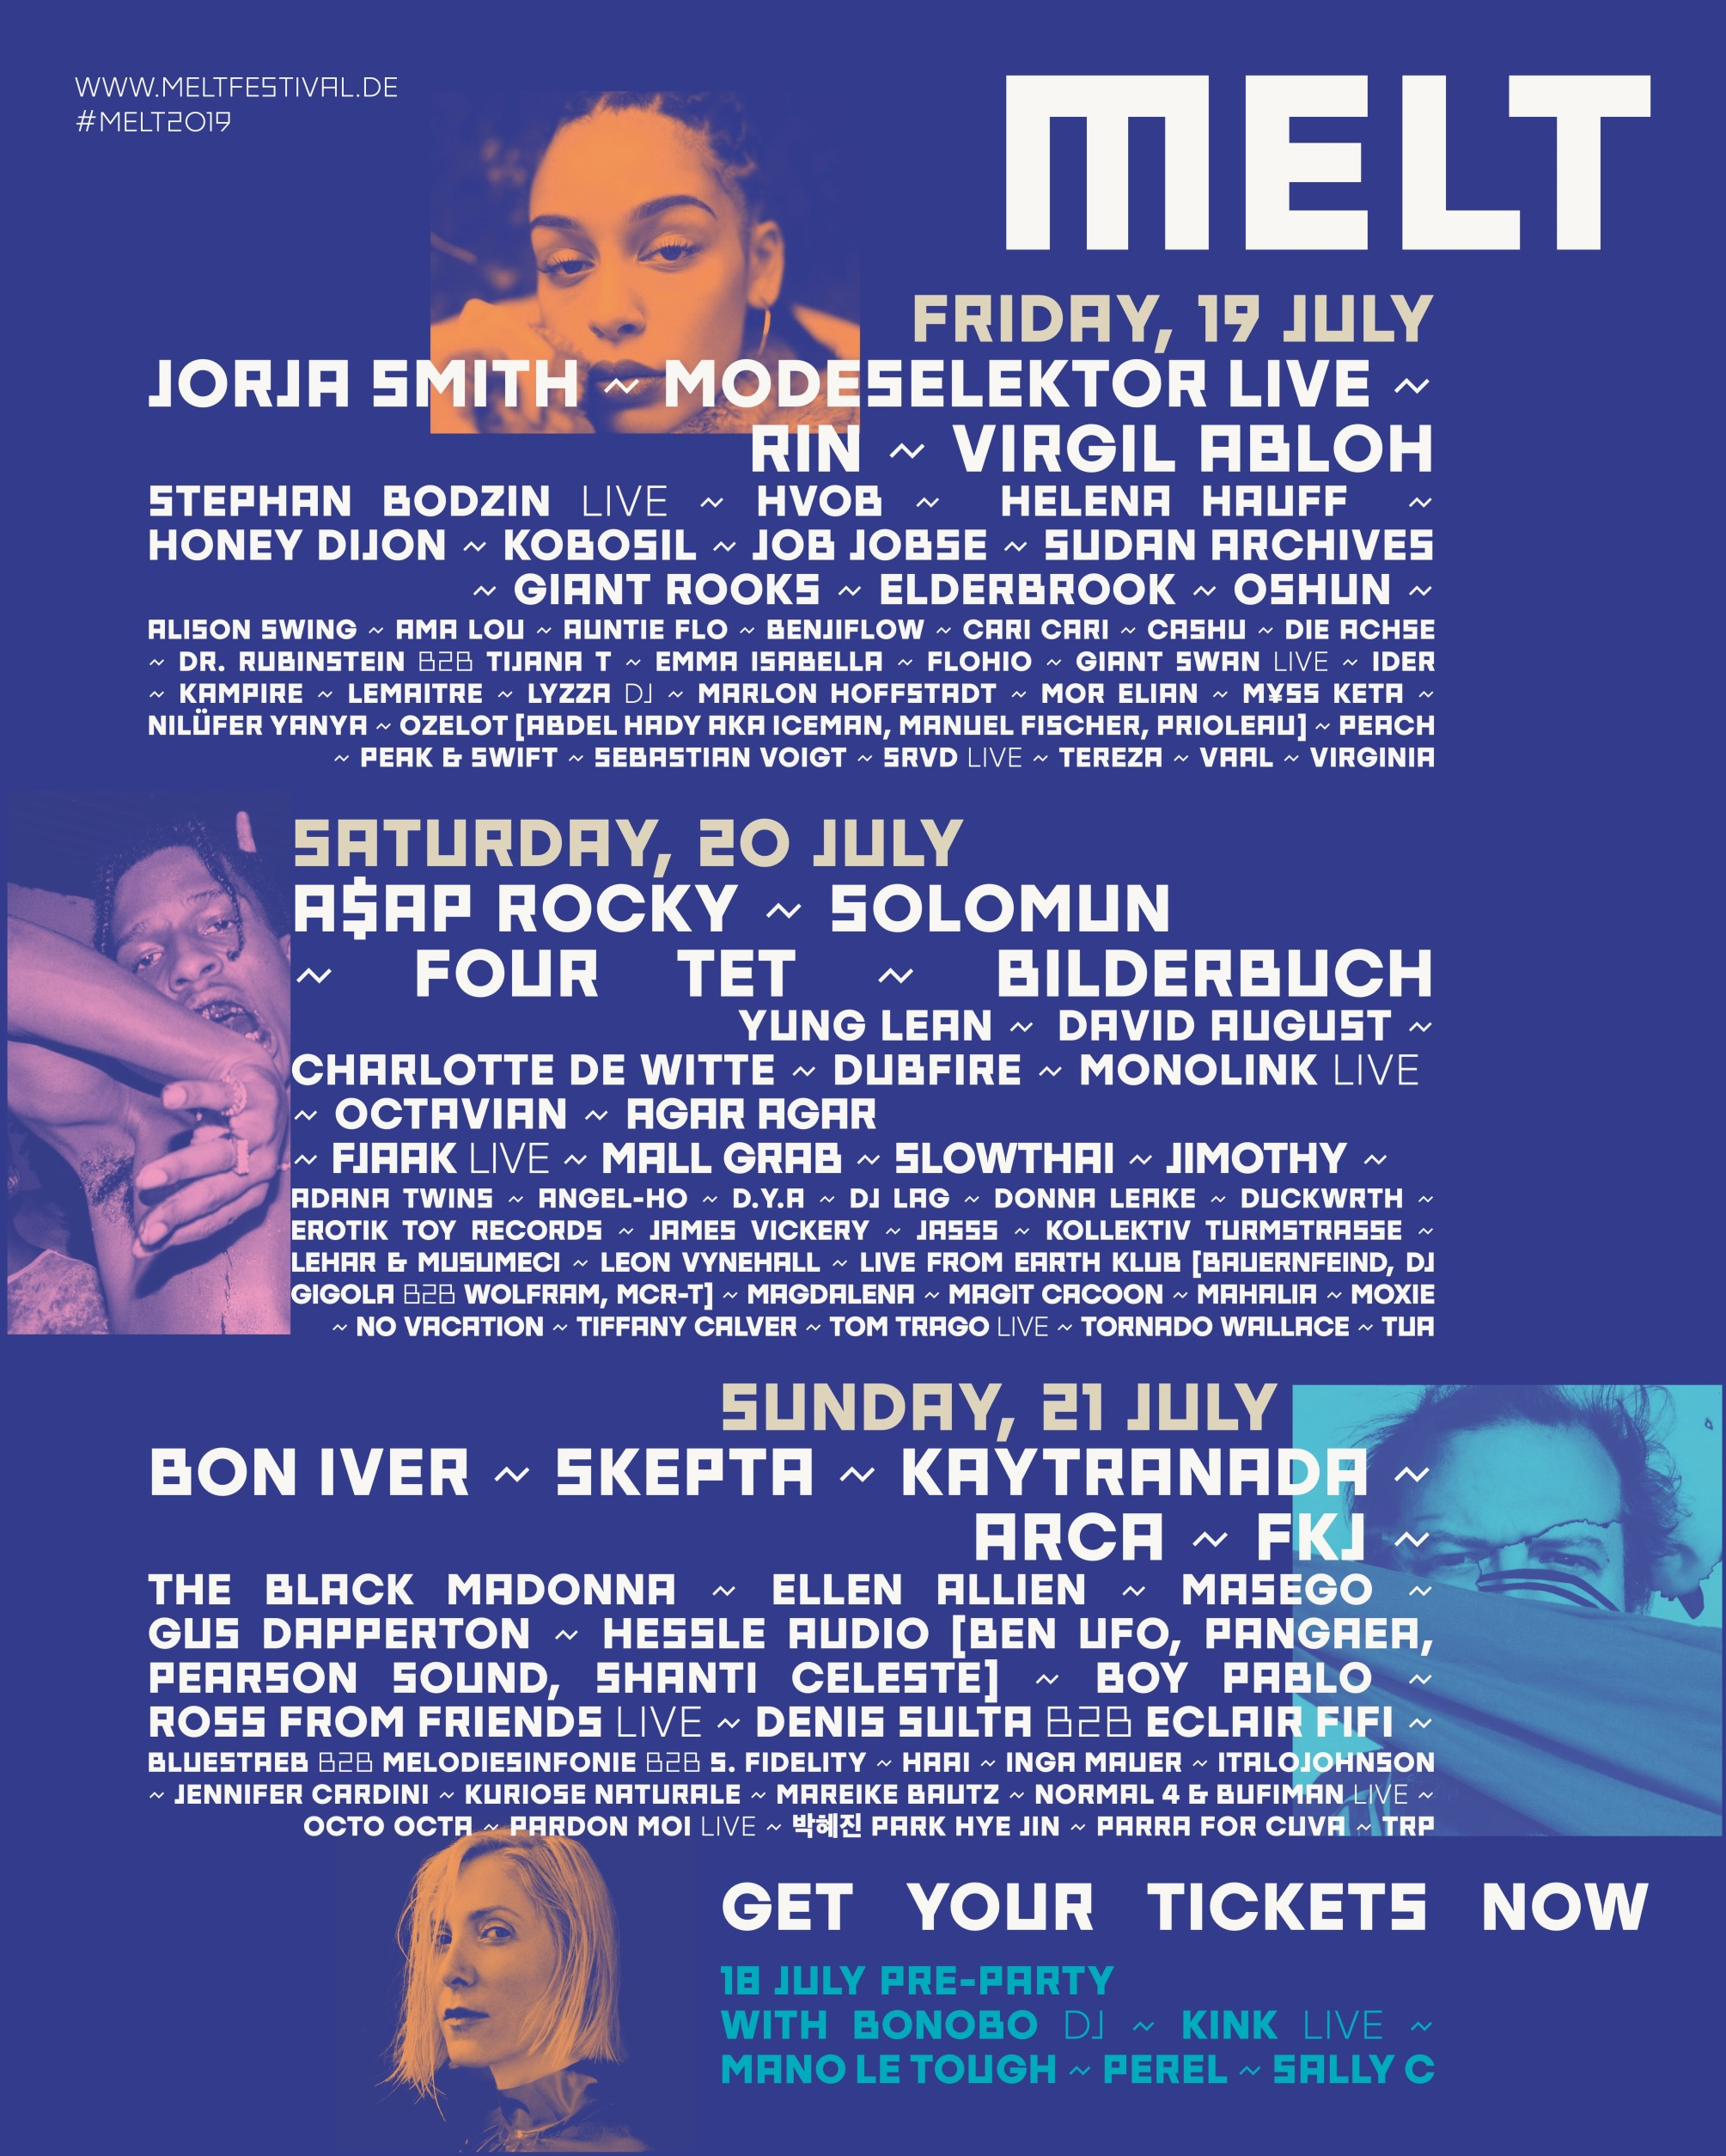 NBHAP Presents MELT Festival 2019 And Its Full Line-Up